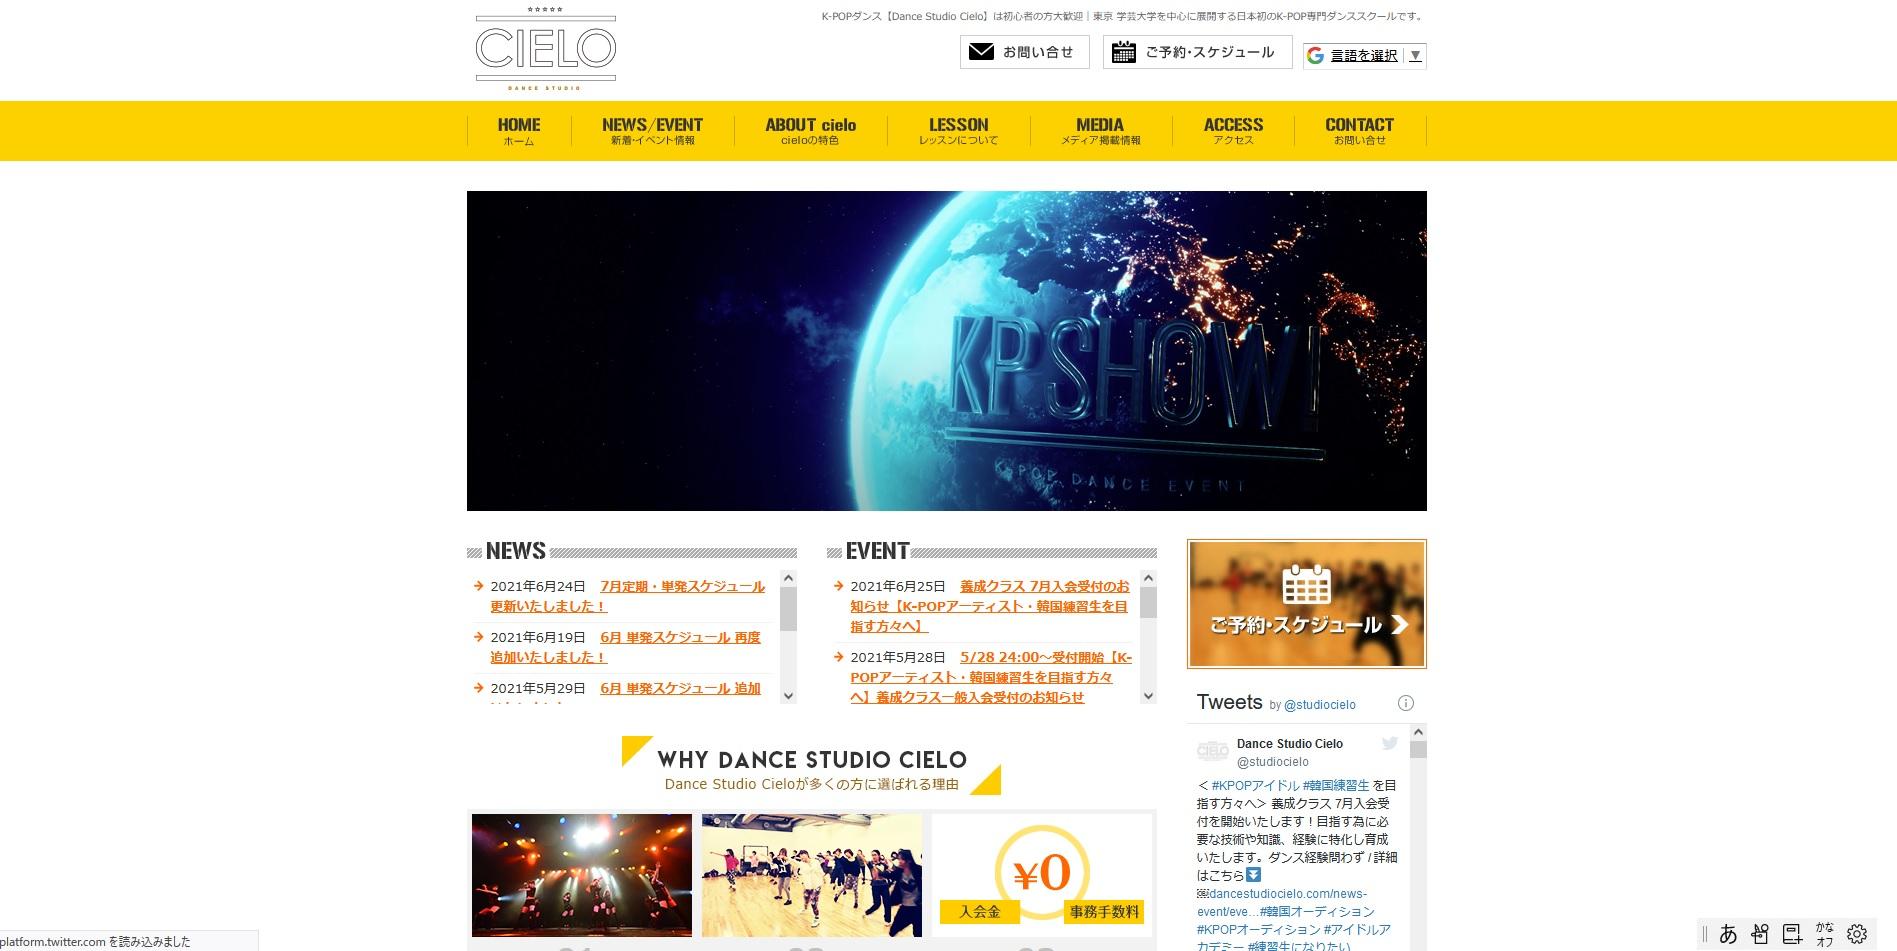 cielo,K-POPデビューを目指すダンススクール9校を徹底紹介【最新版】